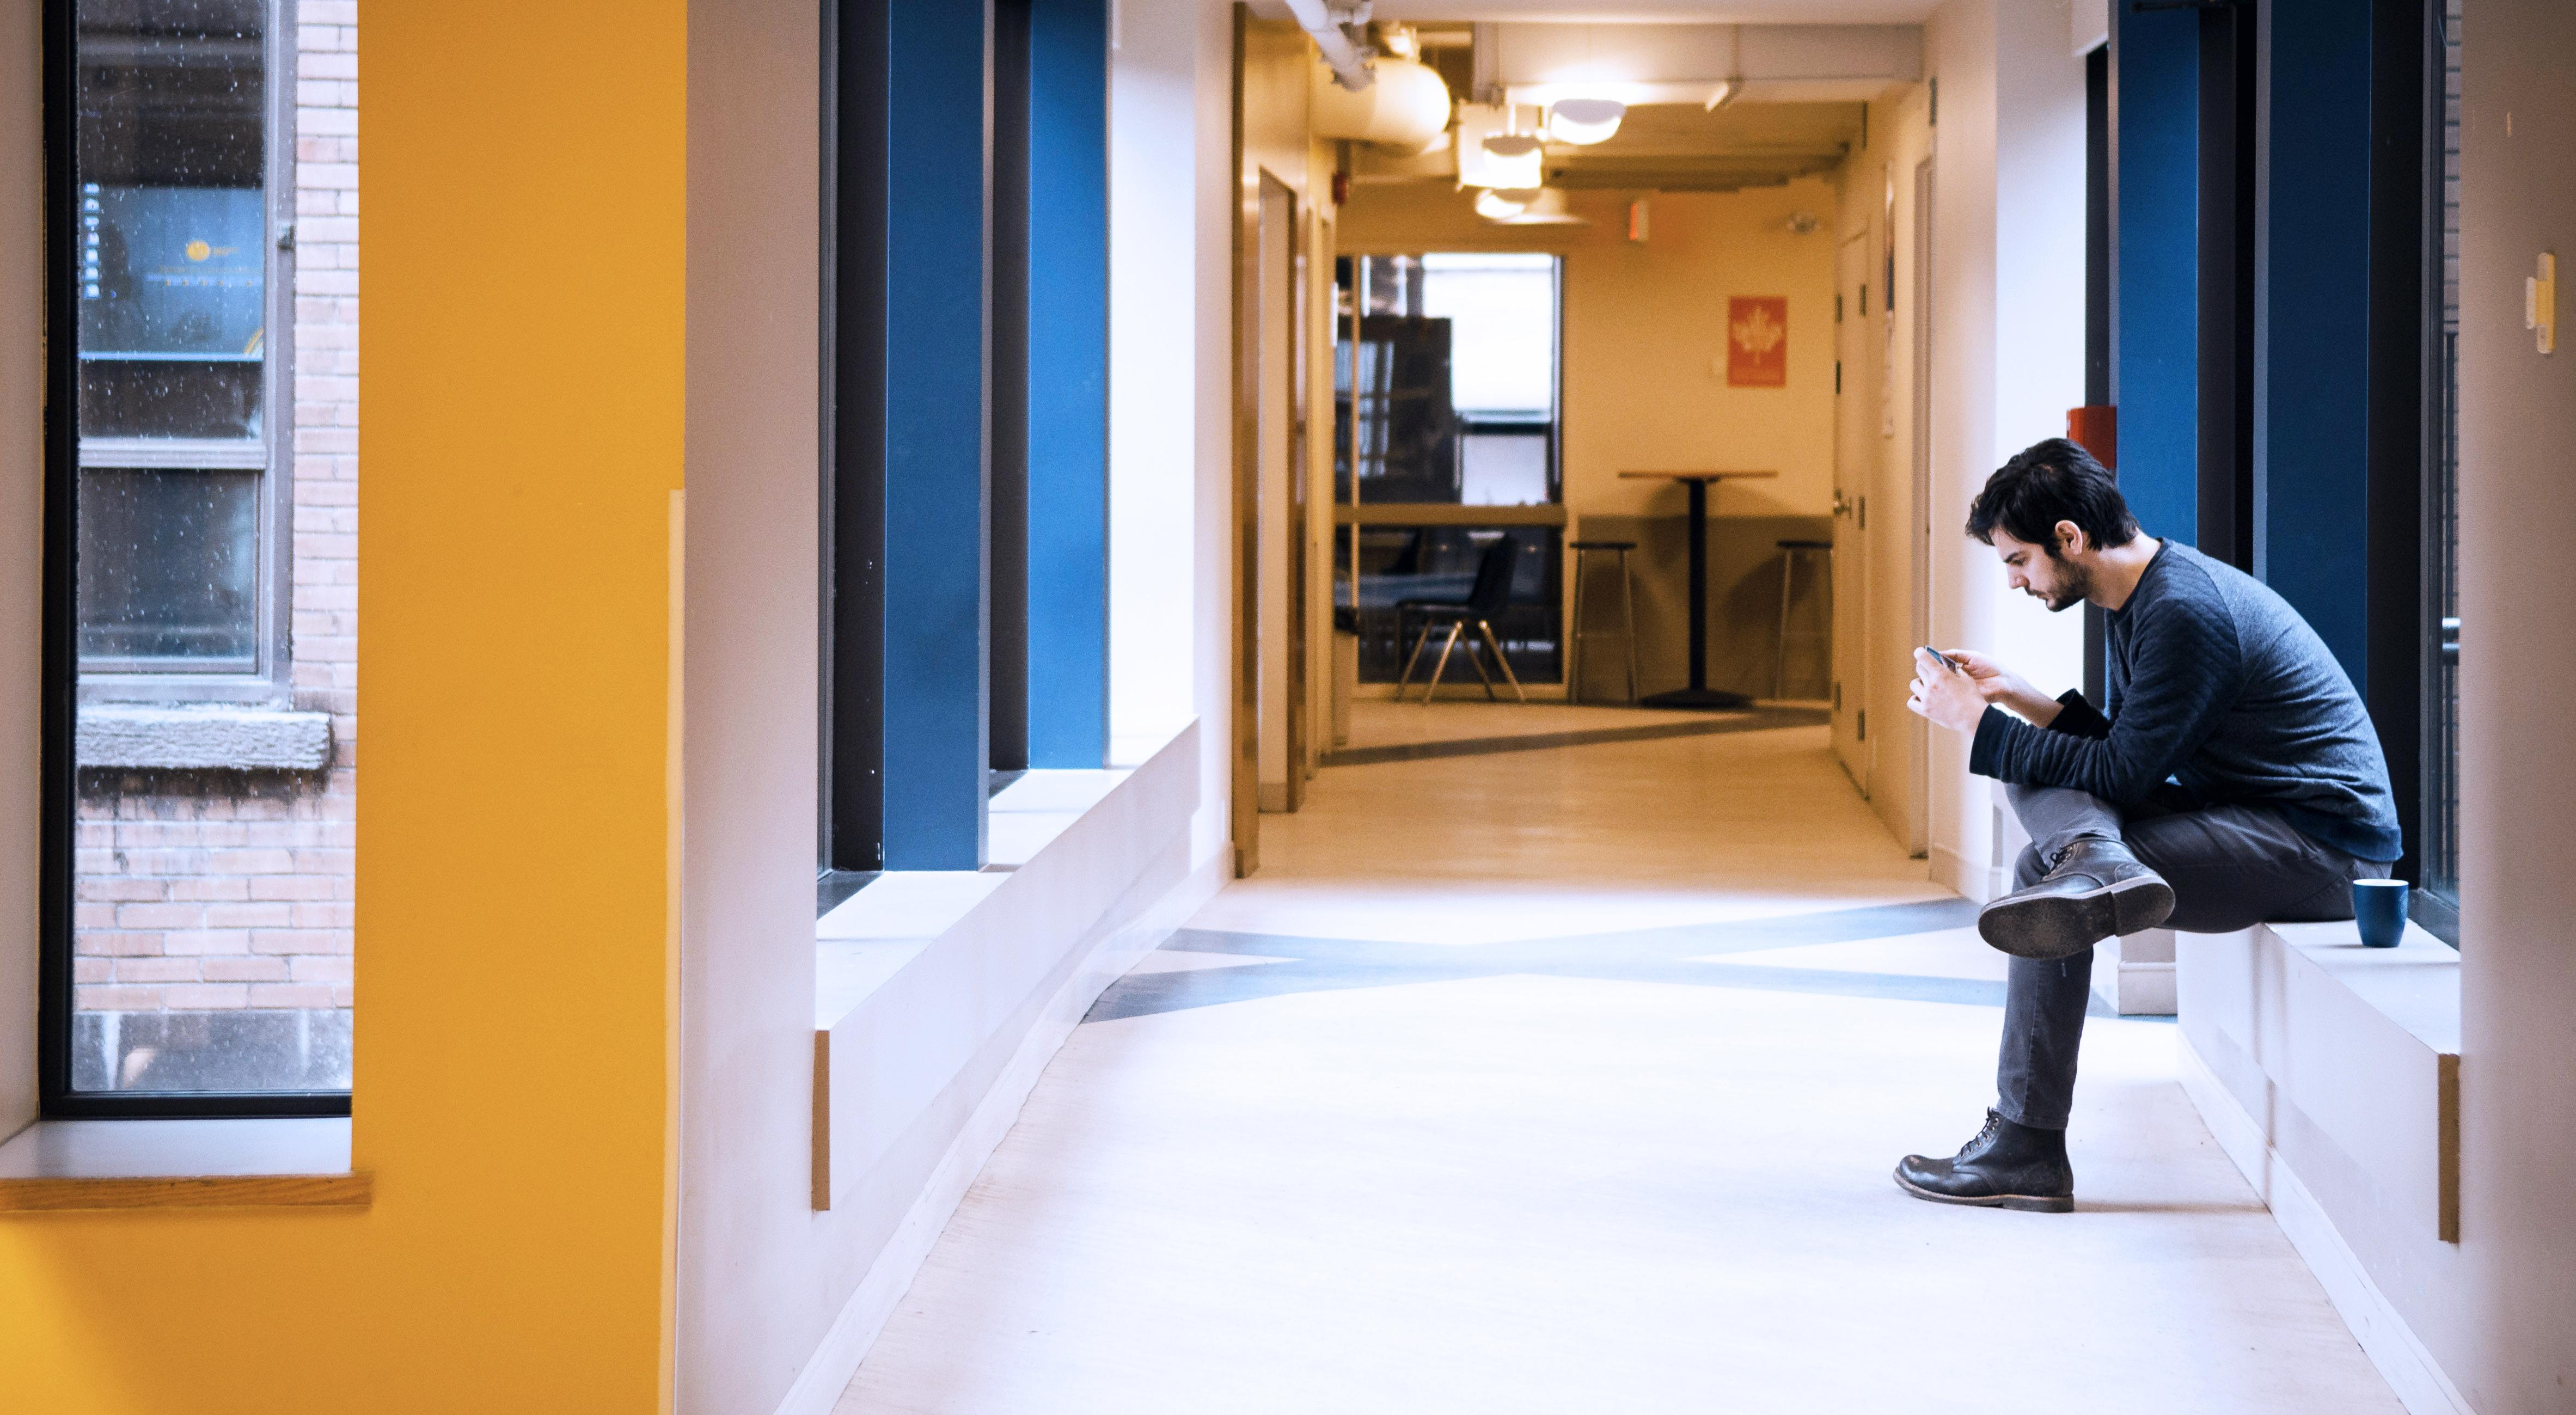 ilsc-montreal-campus-hallway